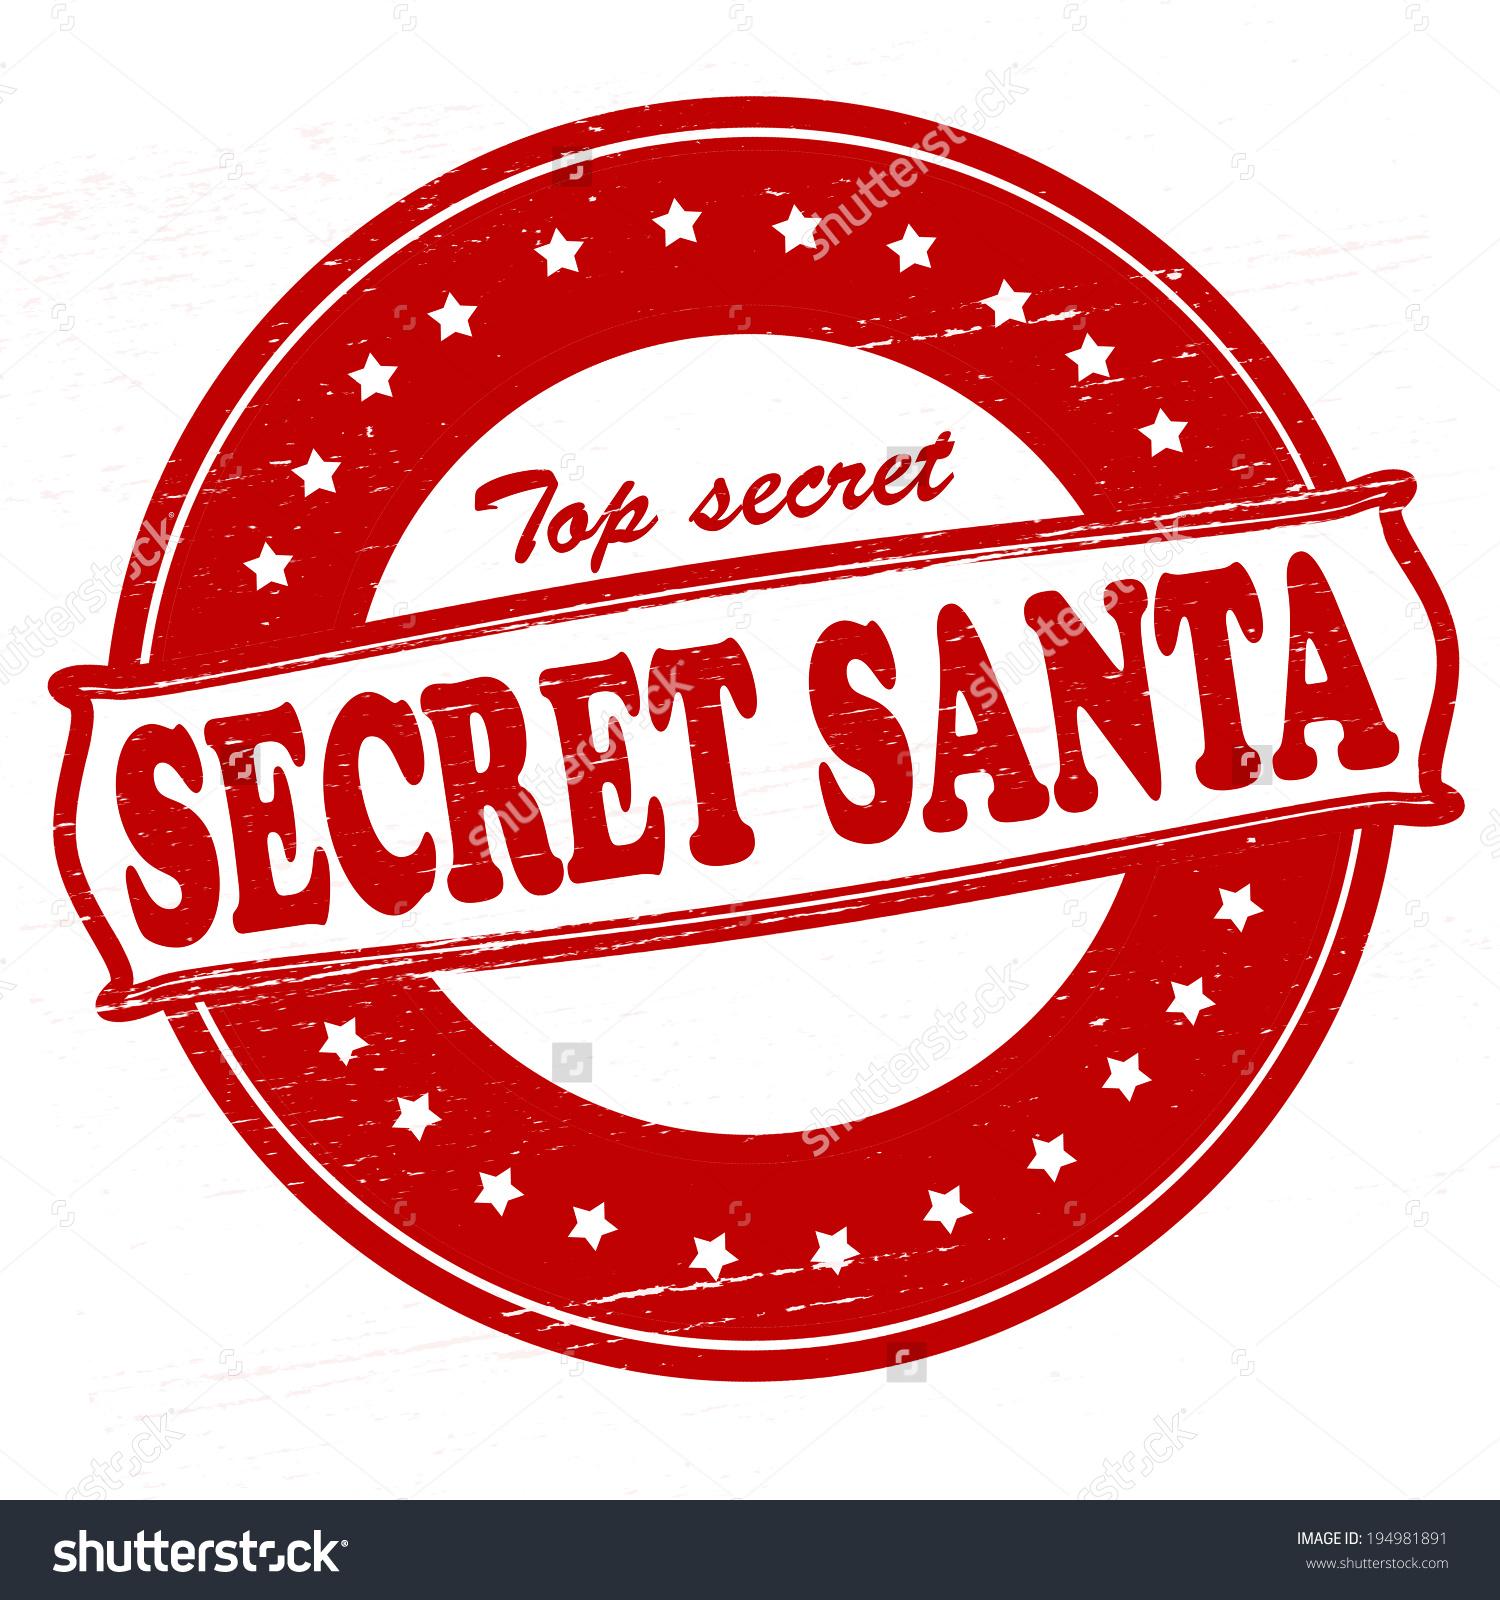 Secret Santa Clipart Free